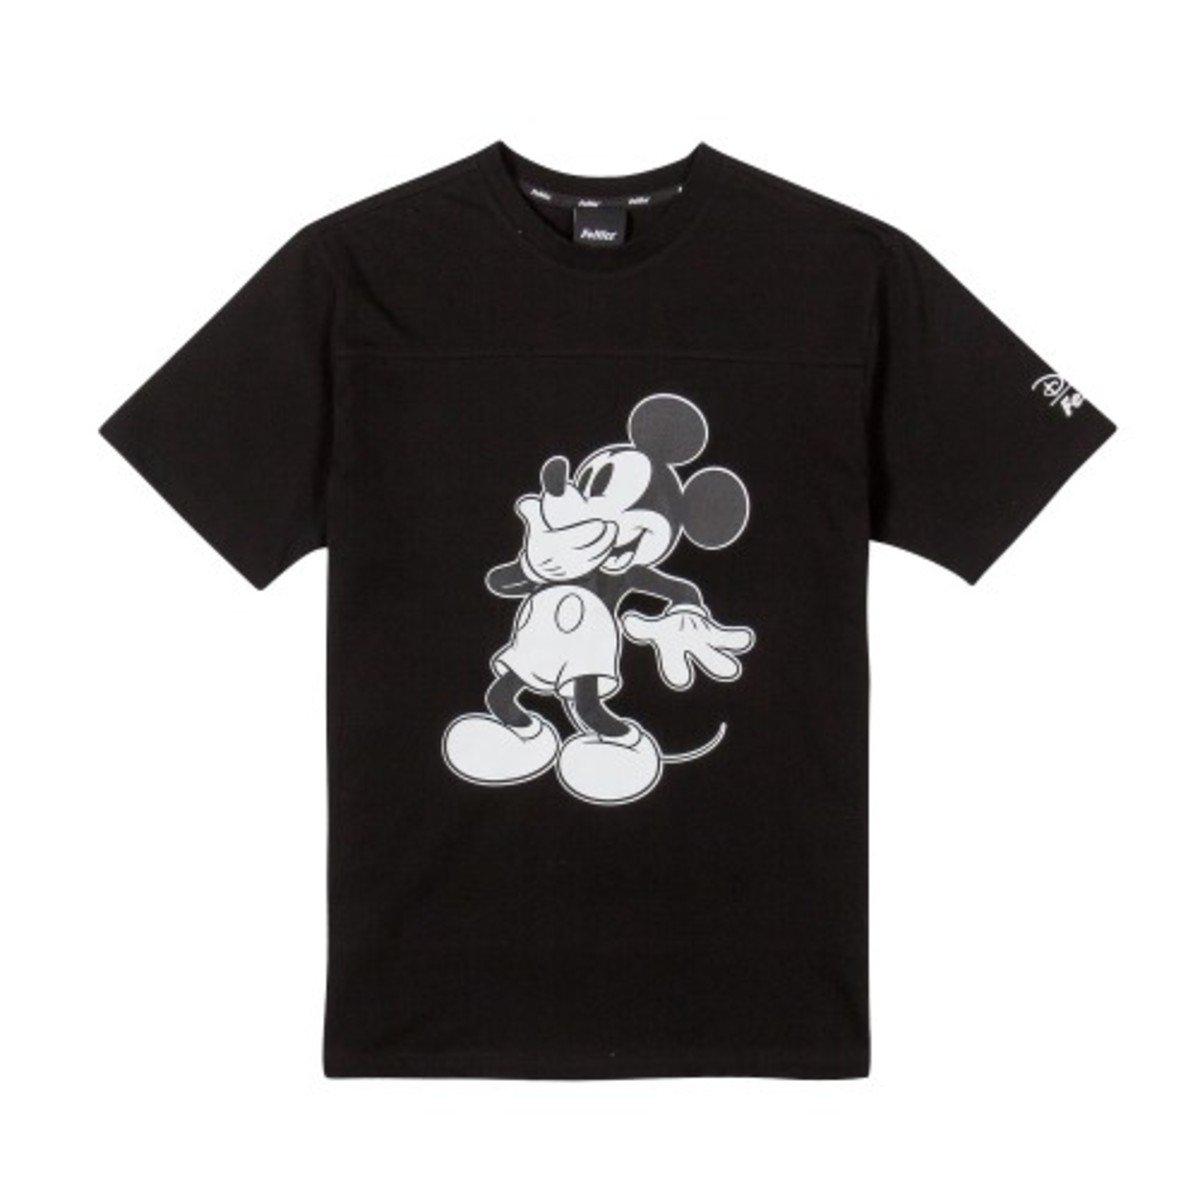 DISNEY MICKEY 1928 拼間色短袖T恤_FEOBMTS55